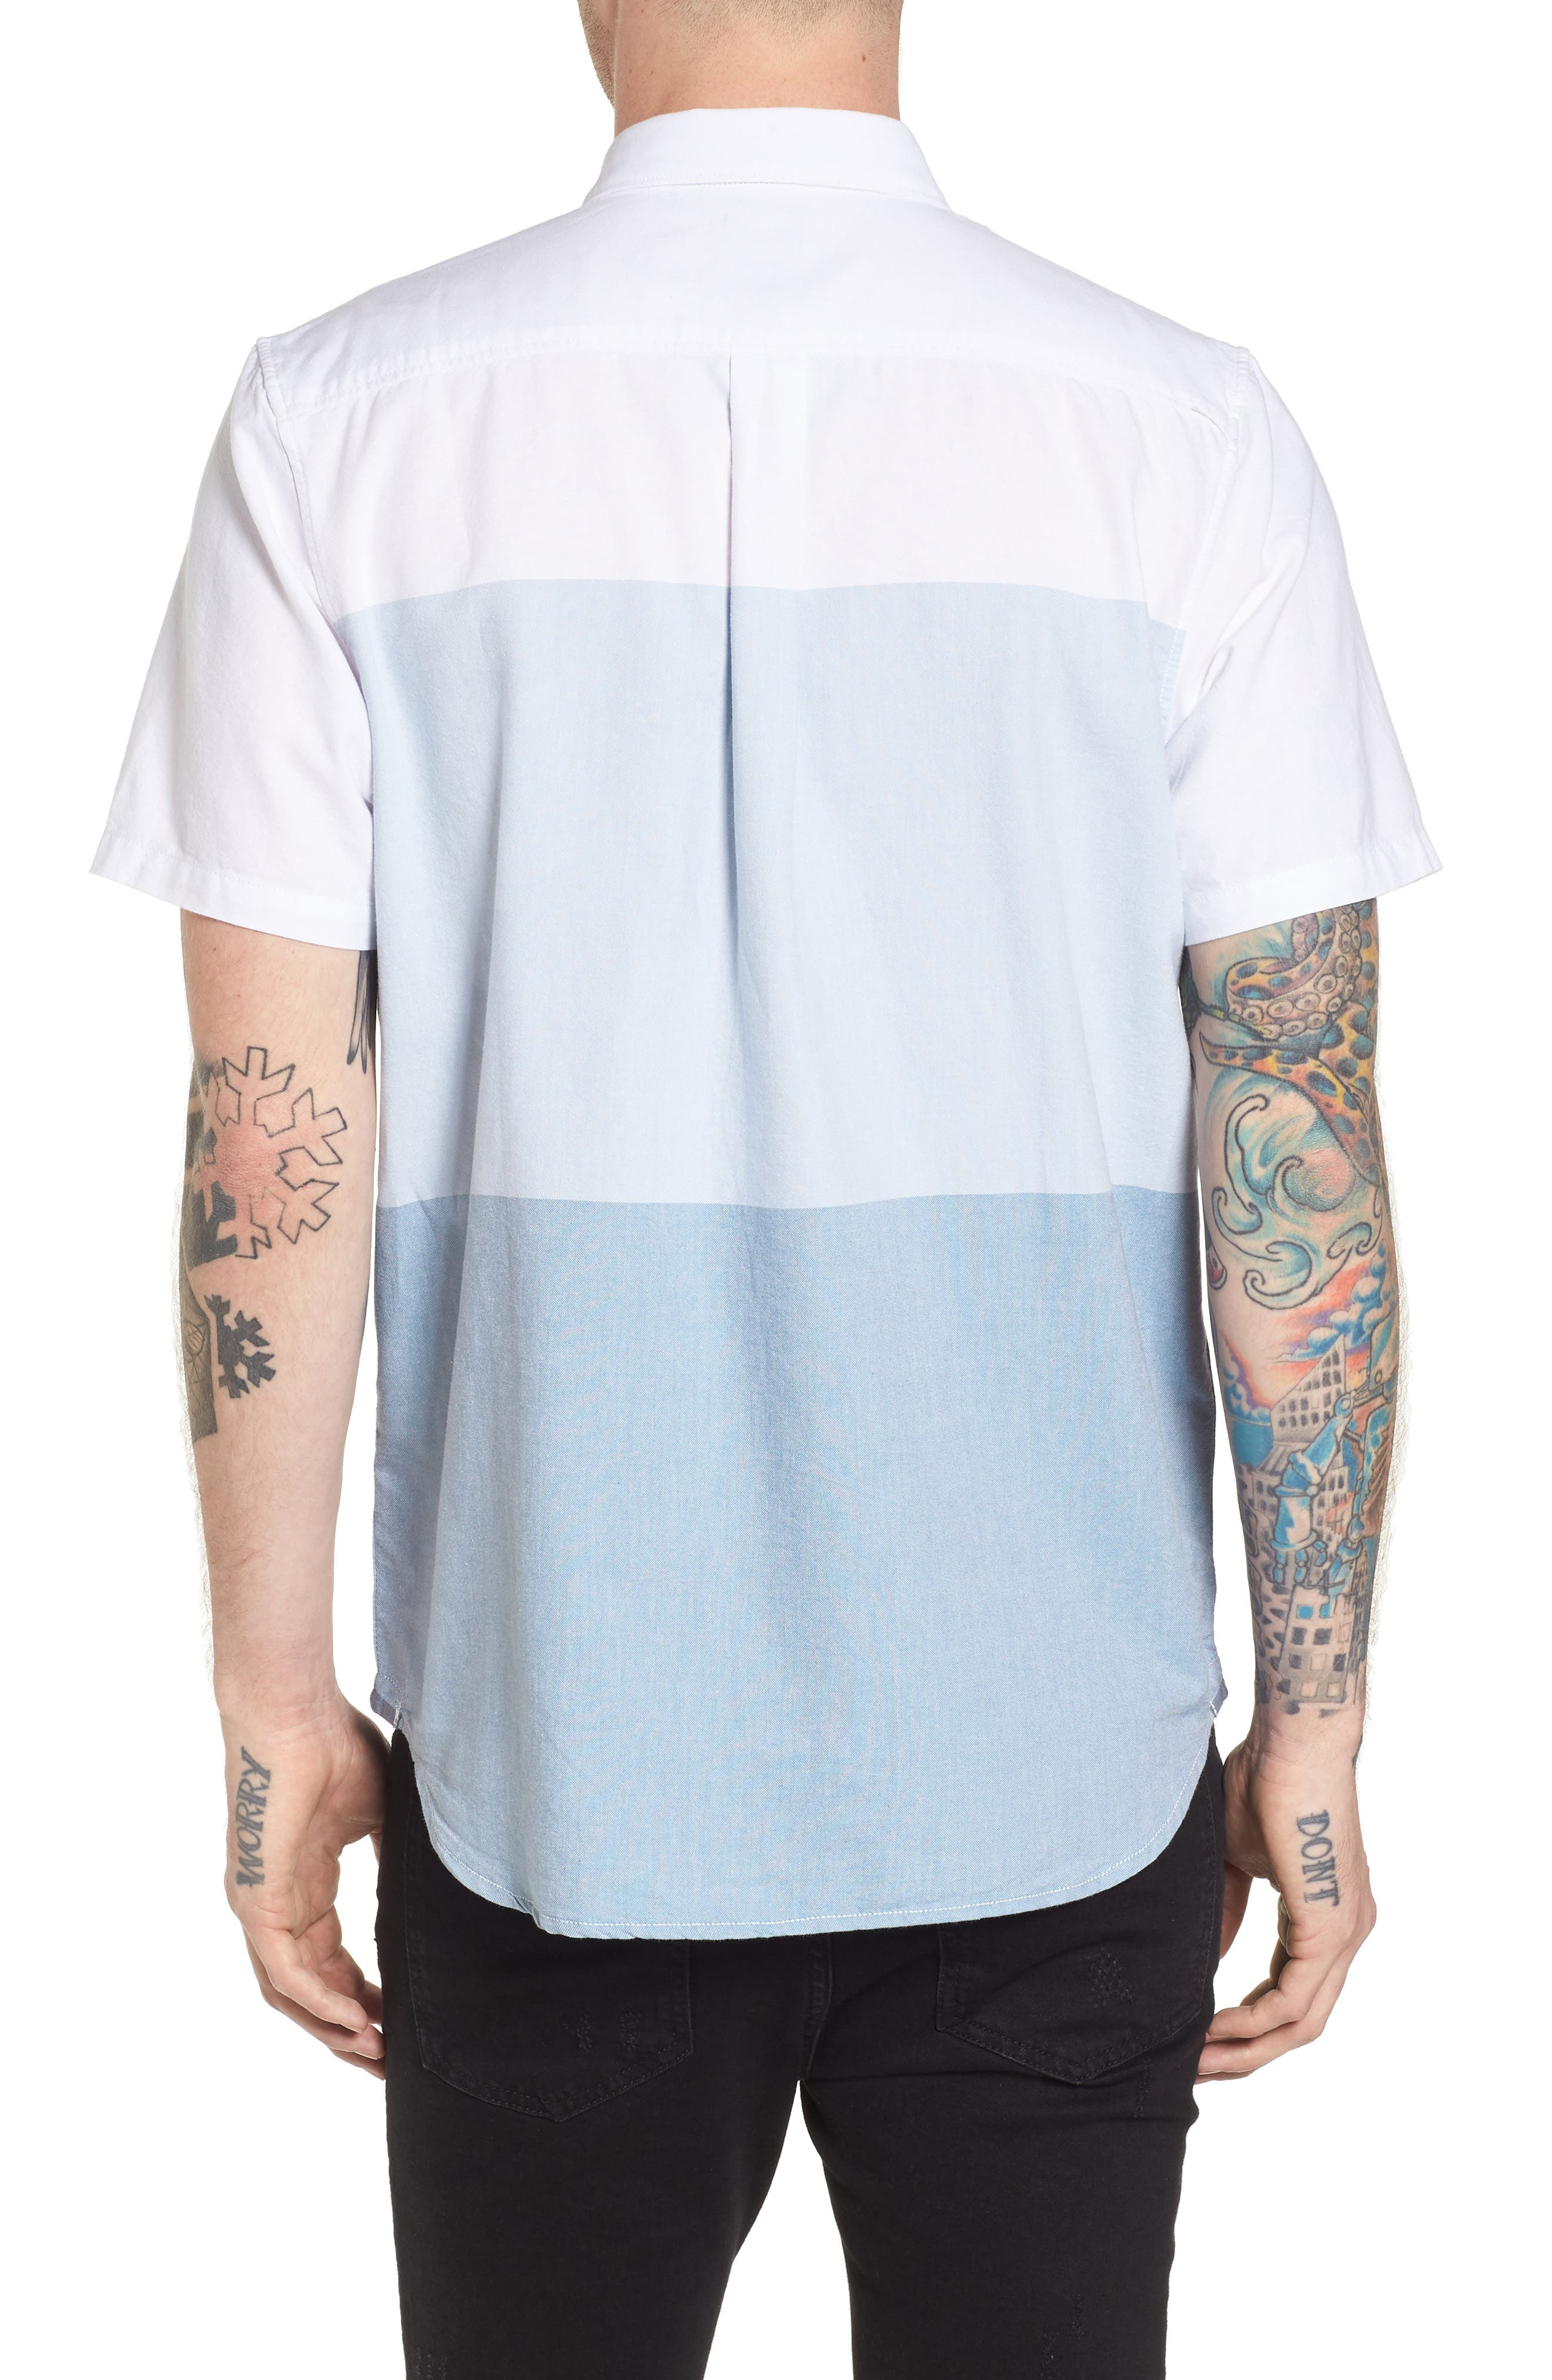 Houser Woven Shirt,                             Alternate thumbnail 3, color,                             White/ Real Teal